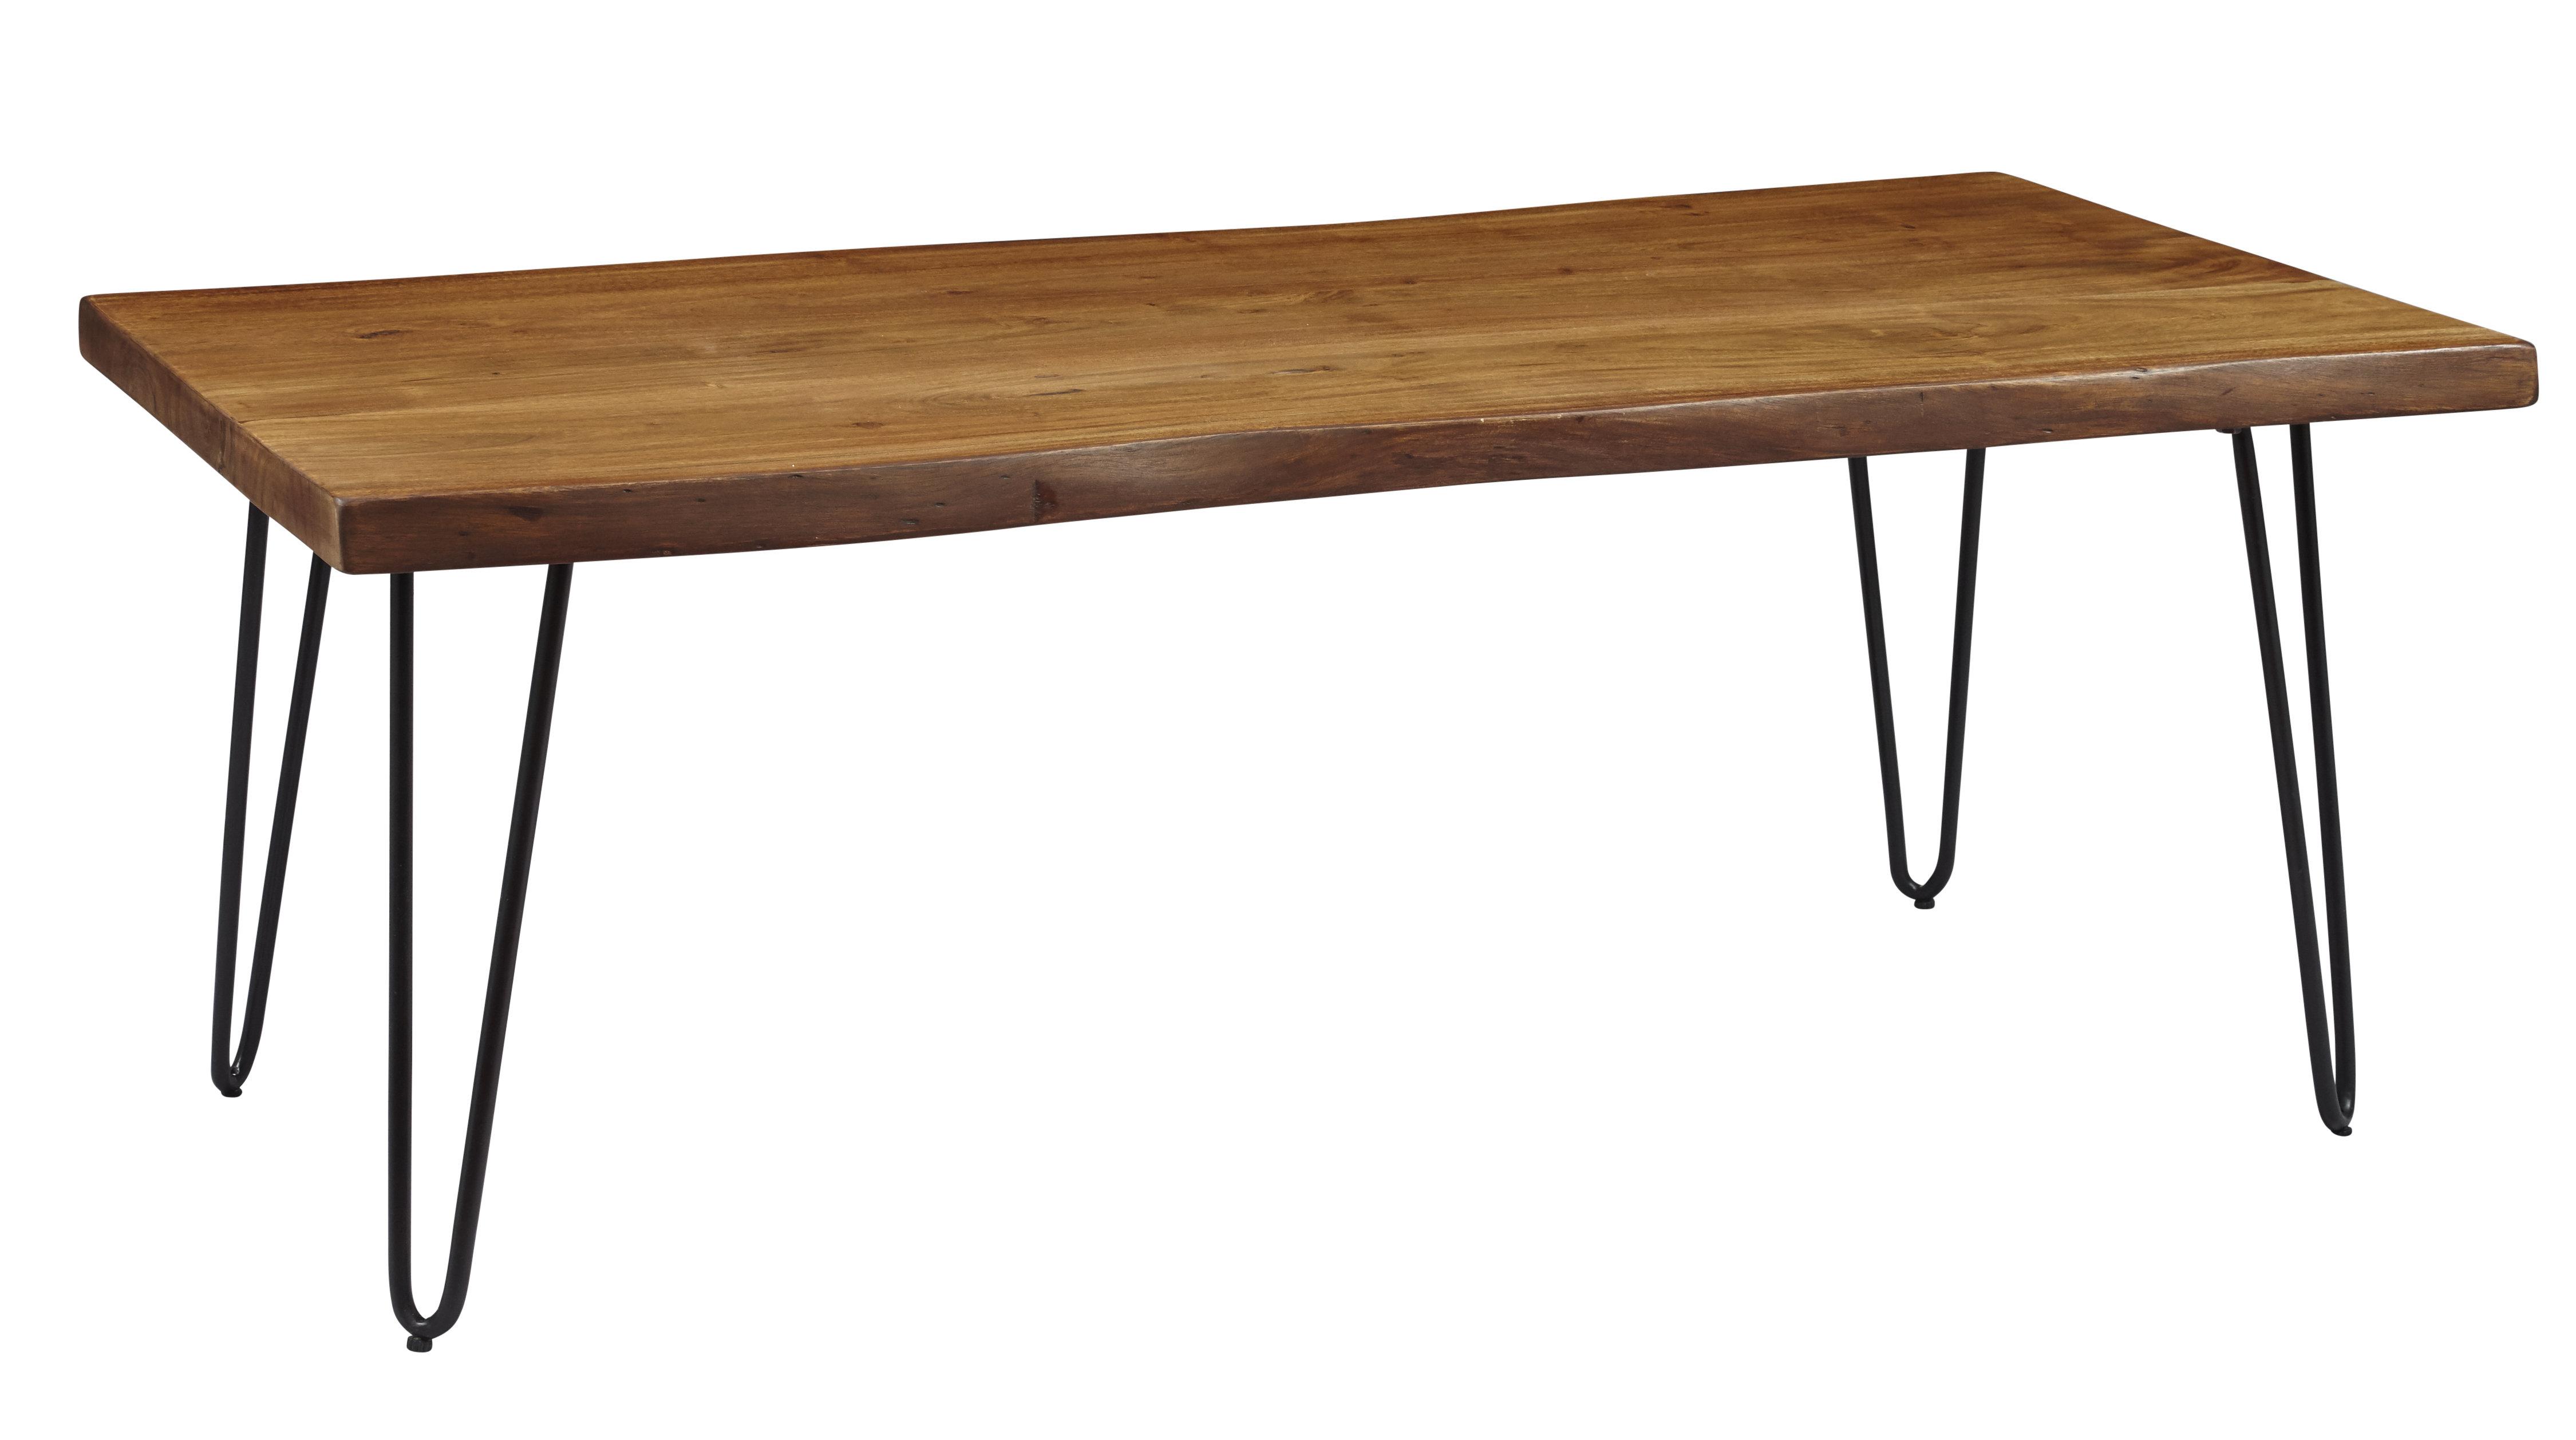 Union Rustic Coosada Wooden Metal Hairpin Legs Coffee Table Wayfair in size 4500 X 2515